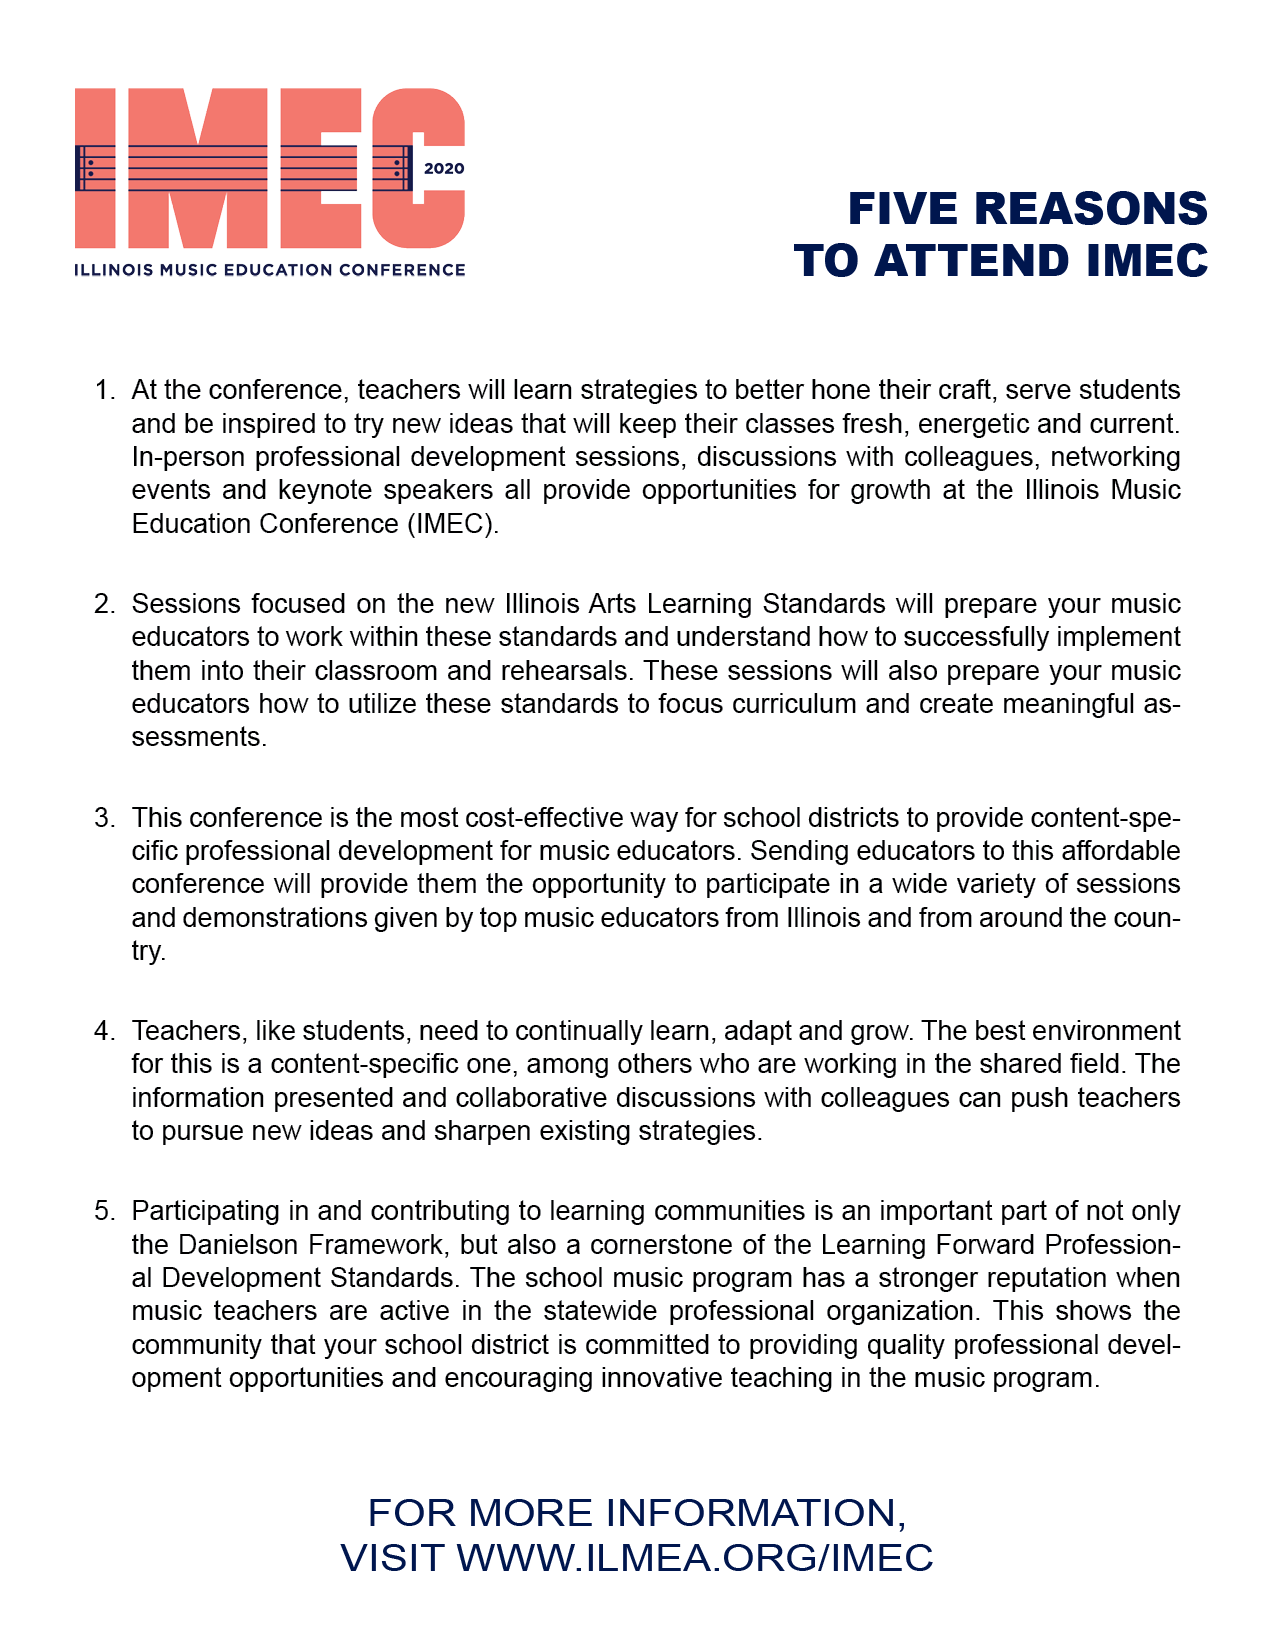 IMEC — Illinois Music Education Association